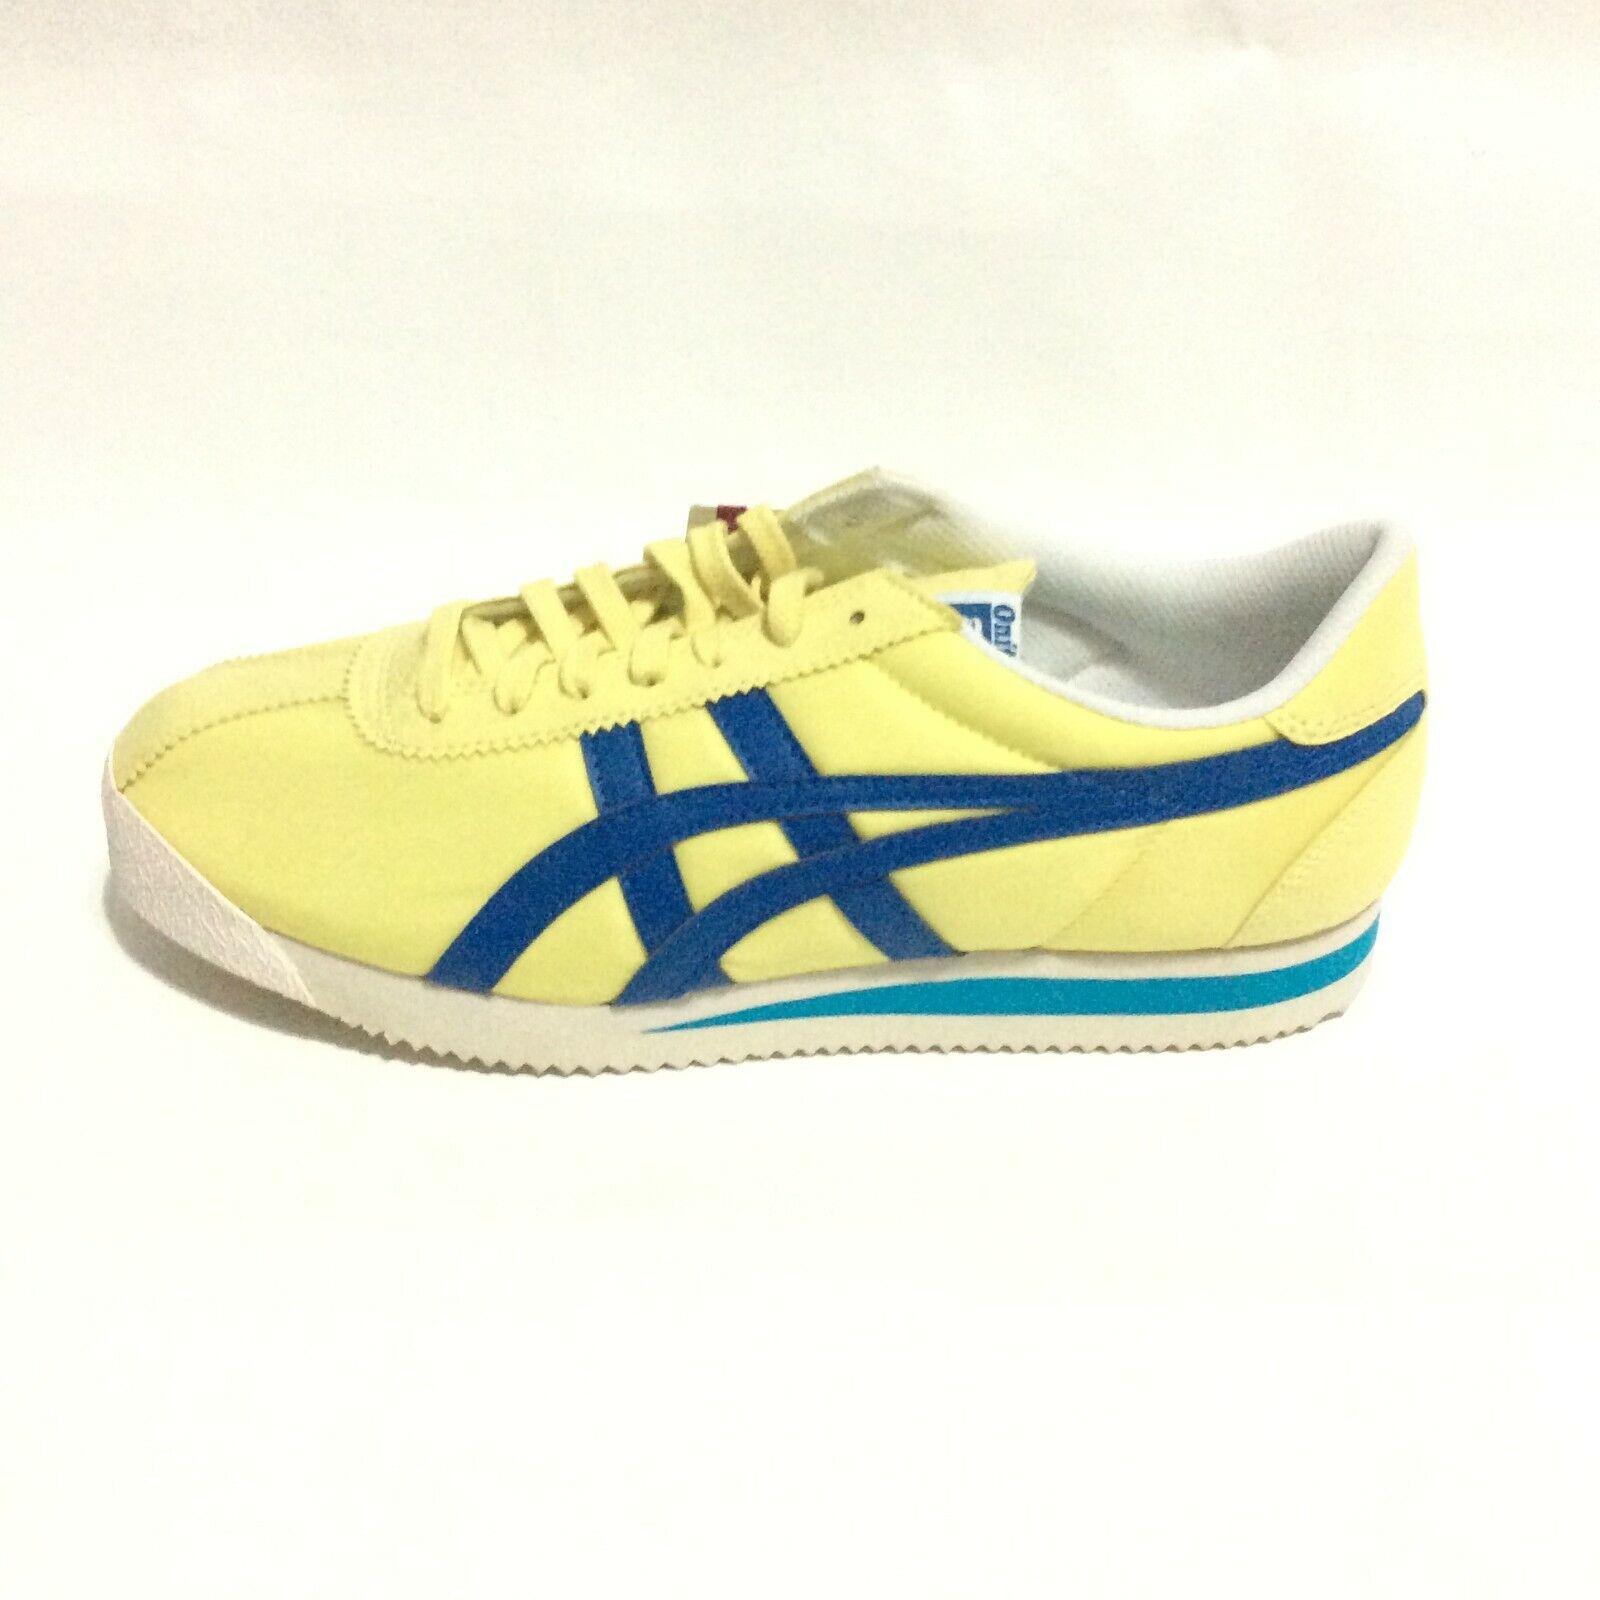 Asics Onitsuka Tiger Corsair Shoes D747N Blue Bruce Lee Style ...